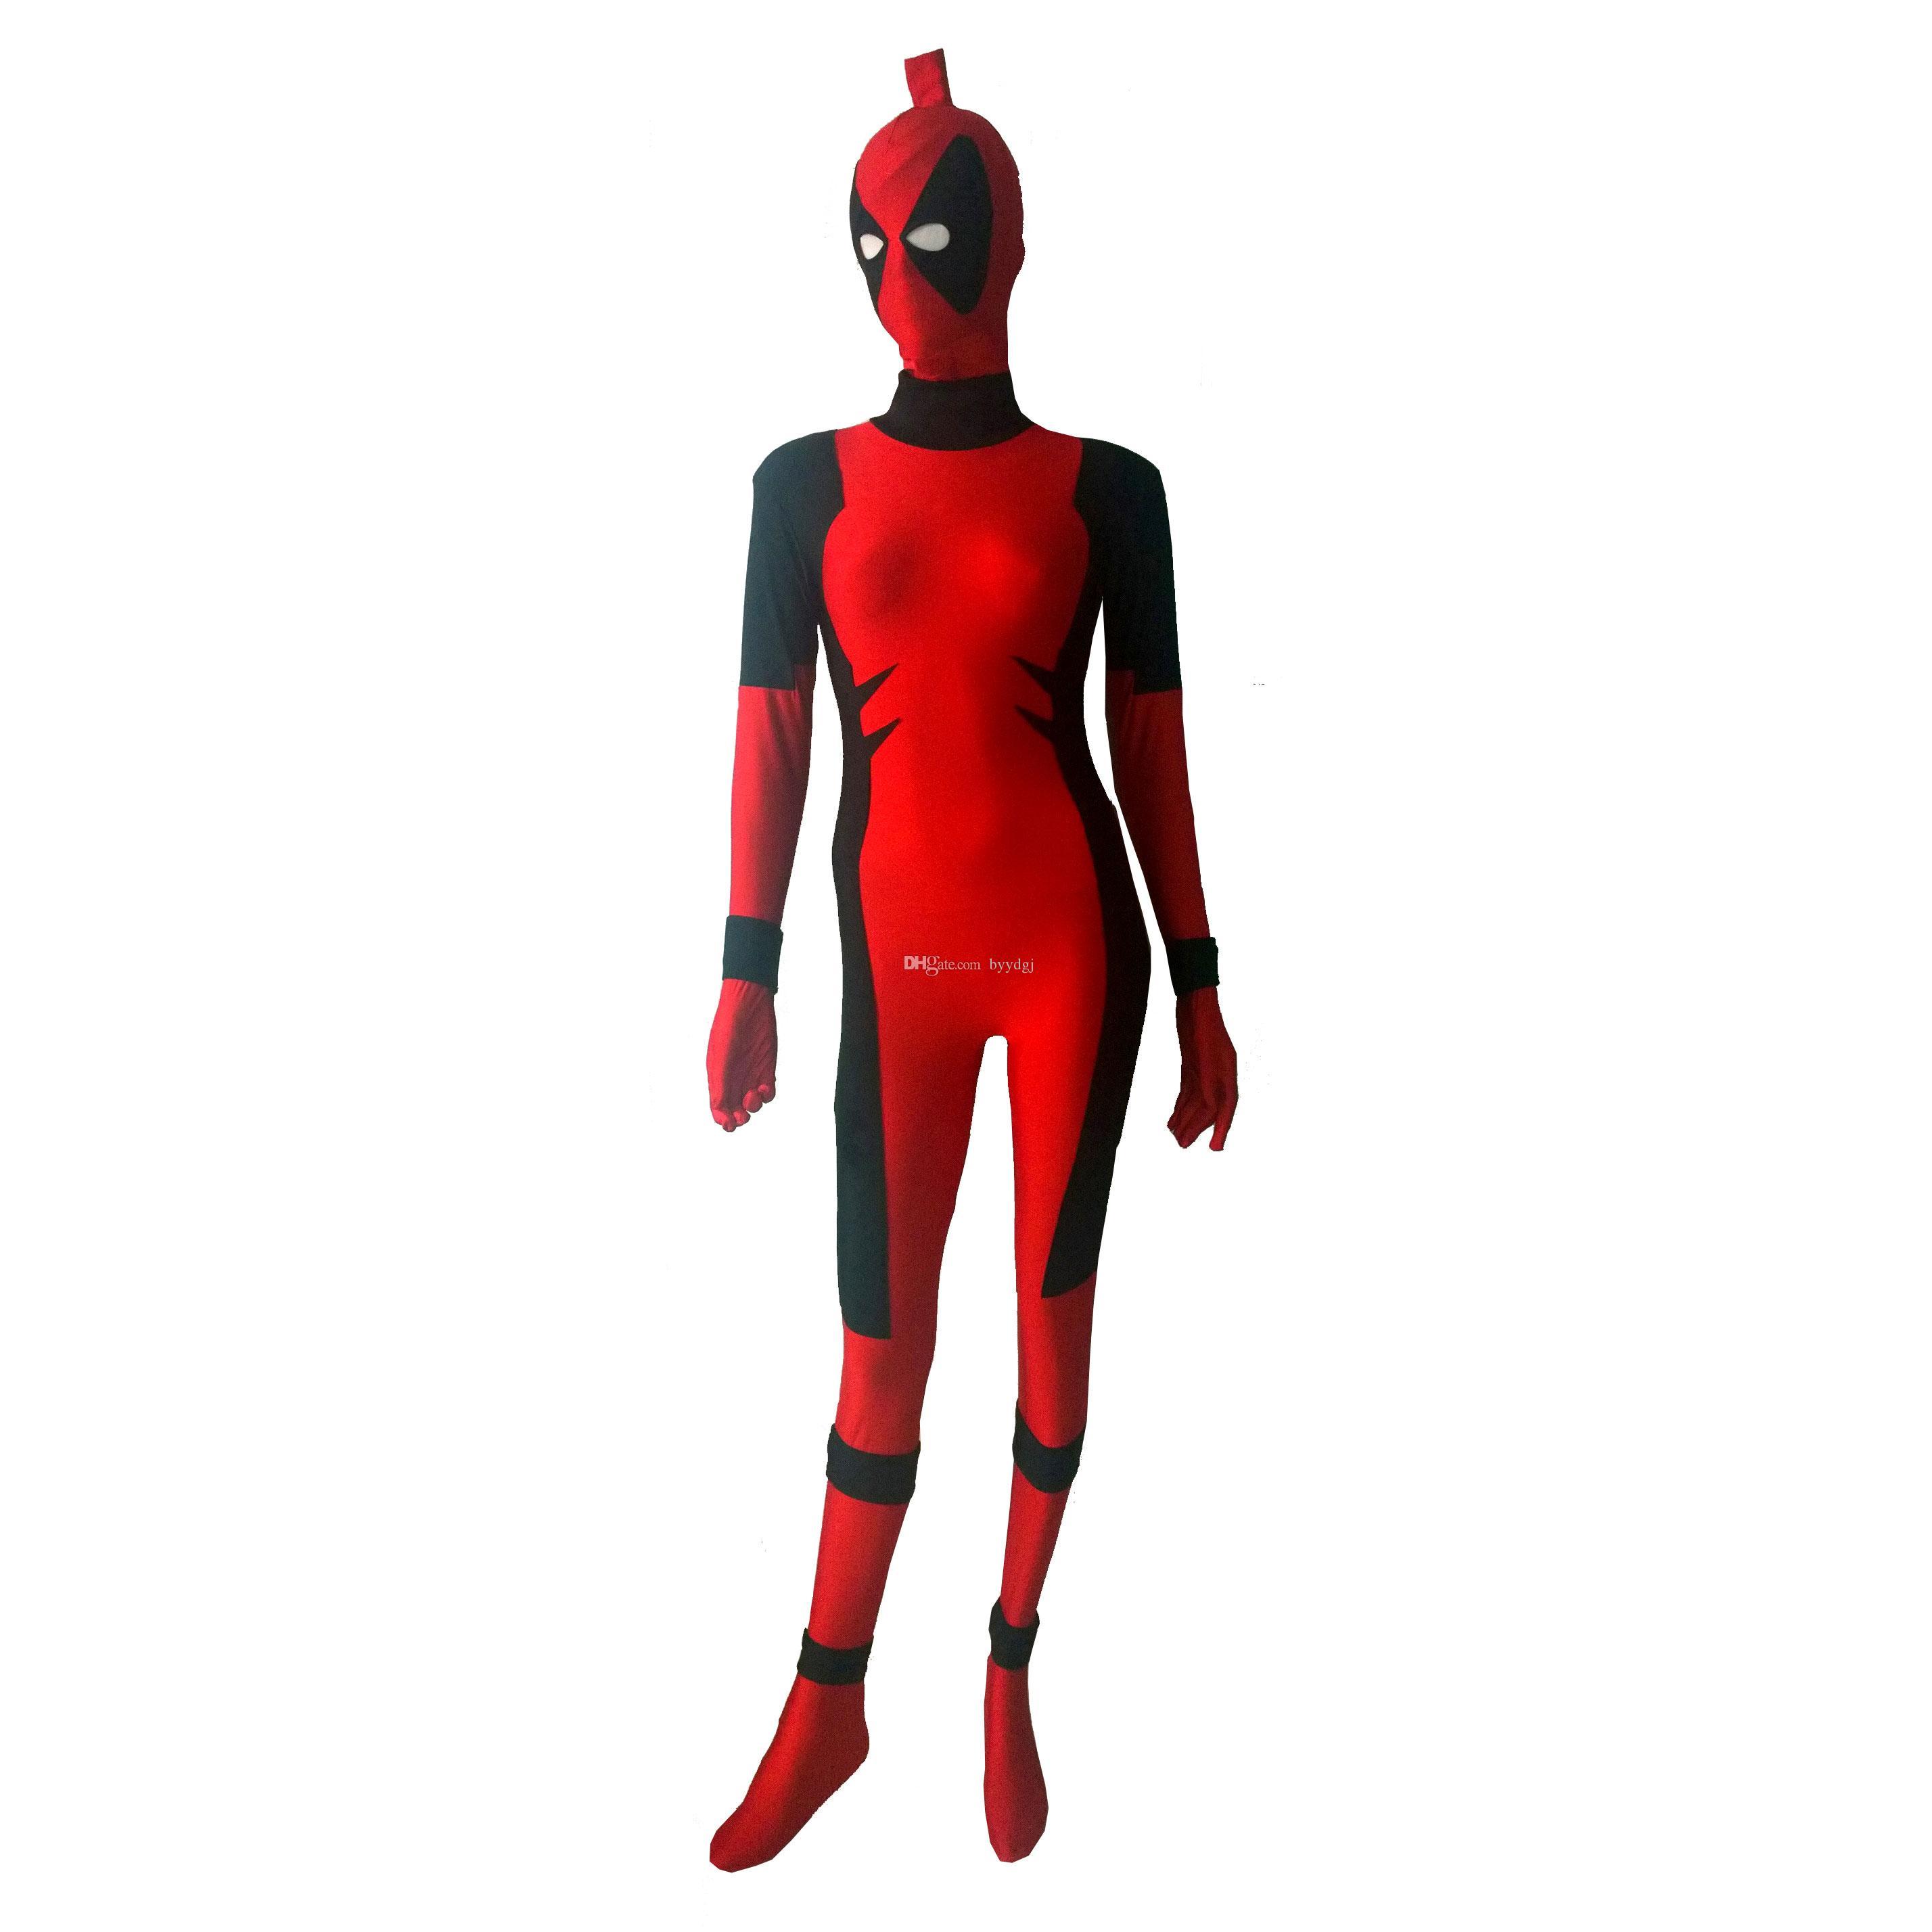 Red Killer Queen Spandex Lycra Costume Prelude to Deadpool Corps Halloween Party Cosplay Zentai Suit